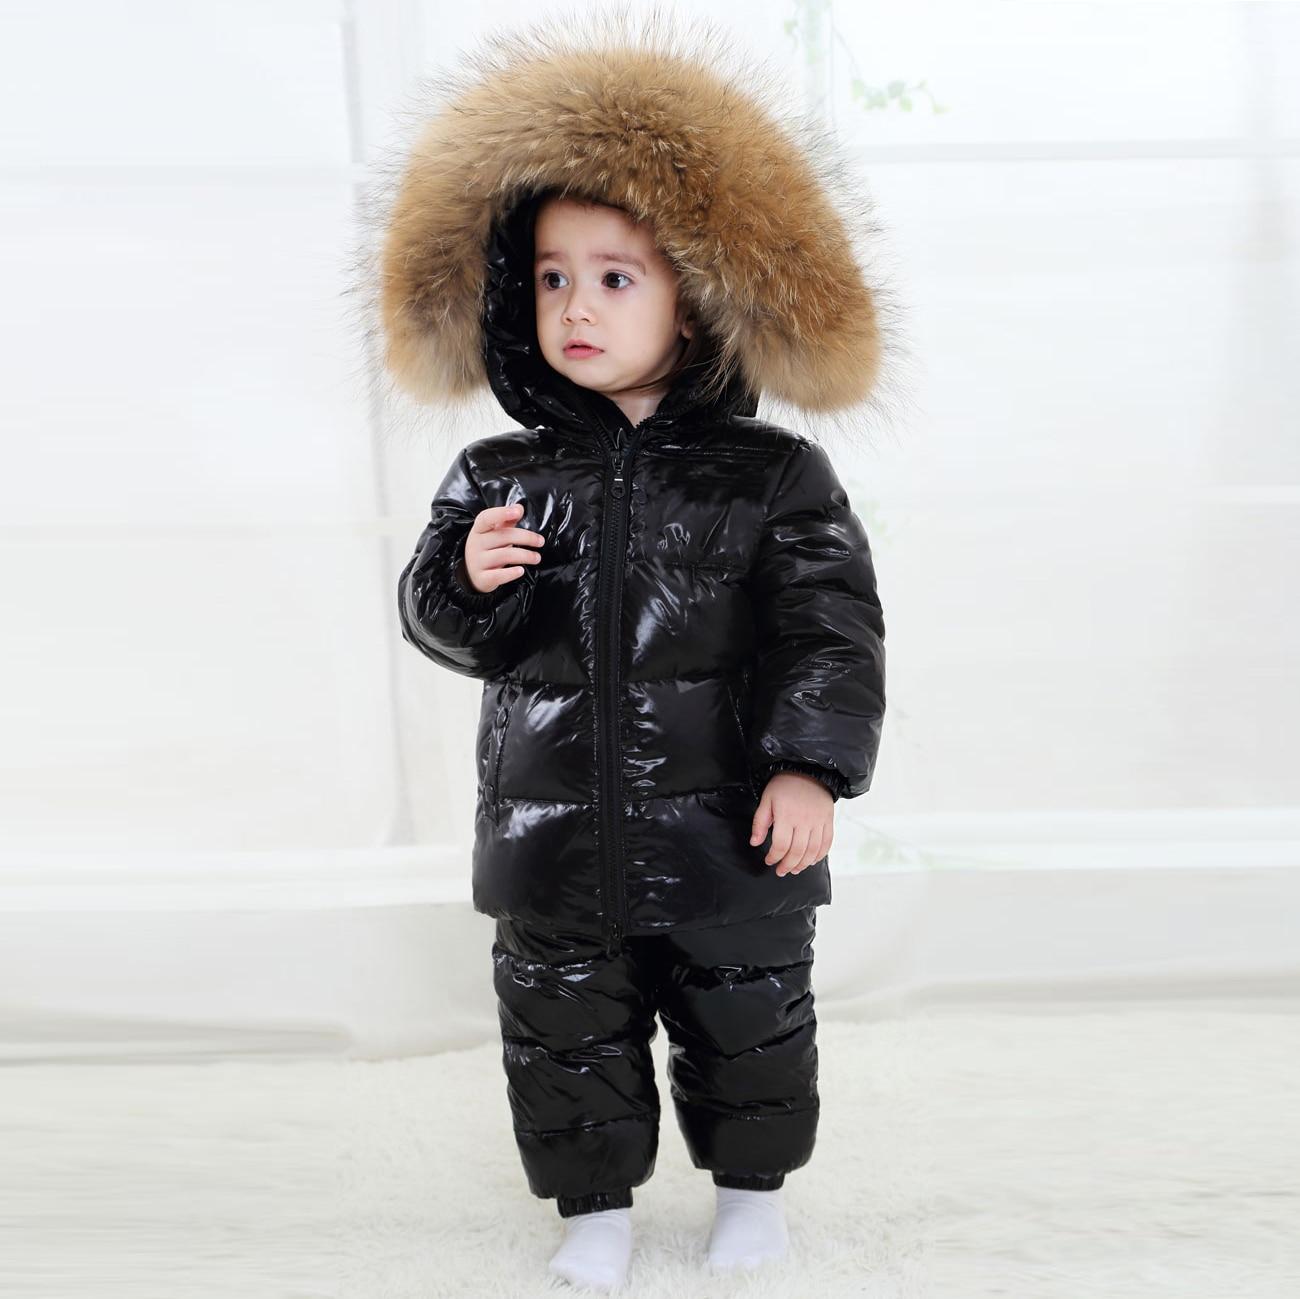 2020 Nieuwe Kinderkleding Set Rusland Winter Thicken Snowsuit 2 6y Jongens 90% Witte Eendendons Kleding Meisjes Winter Outfit jas